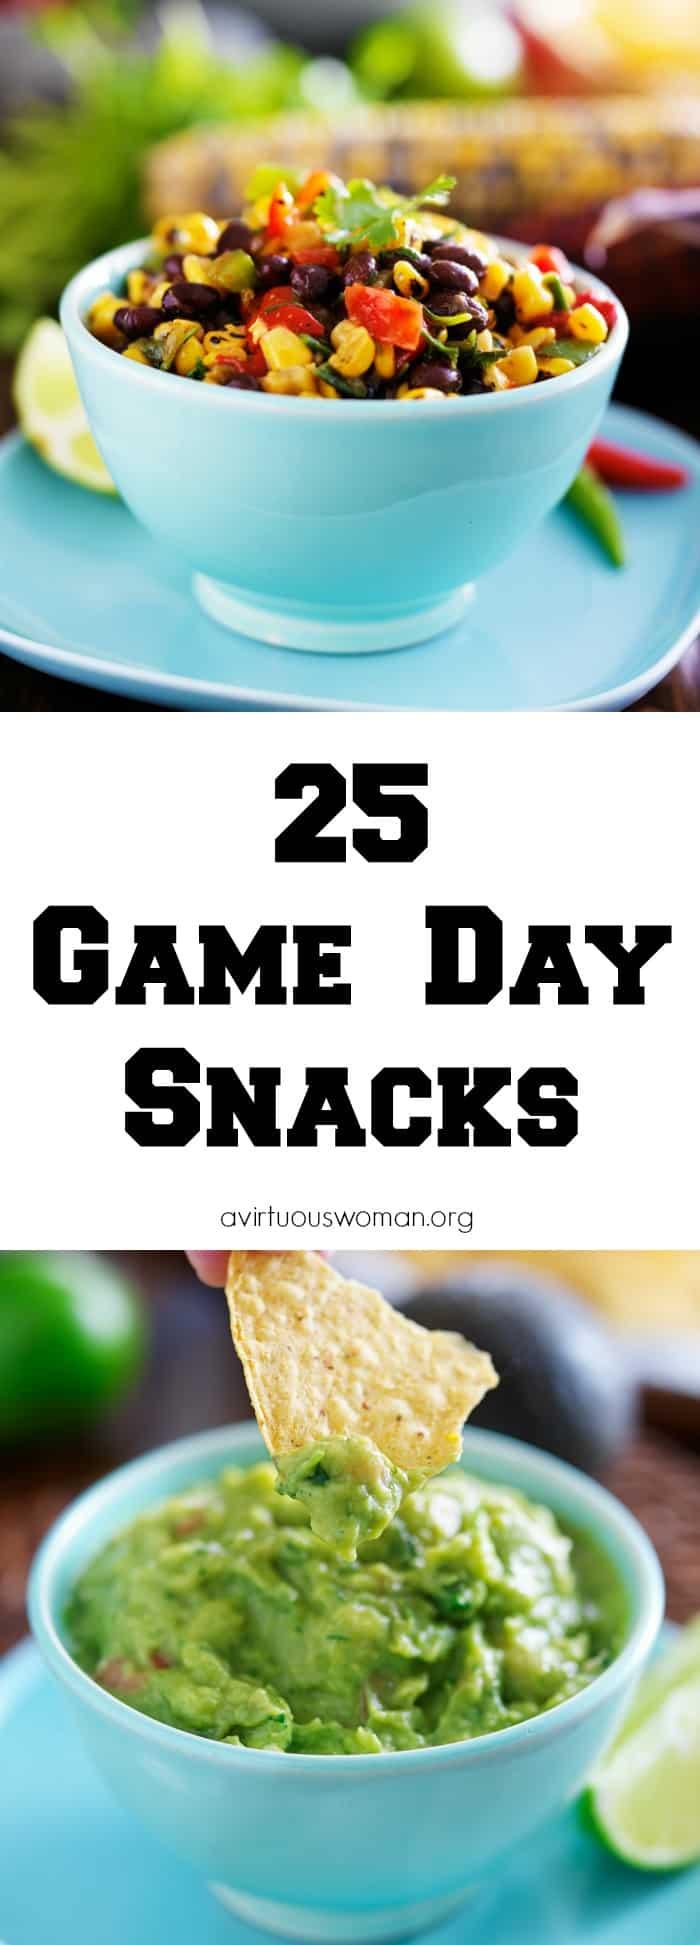 25 Game Day Snacks - YUM! @ AVirtuousWoman.org